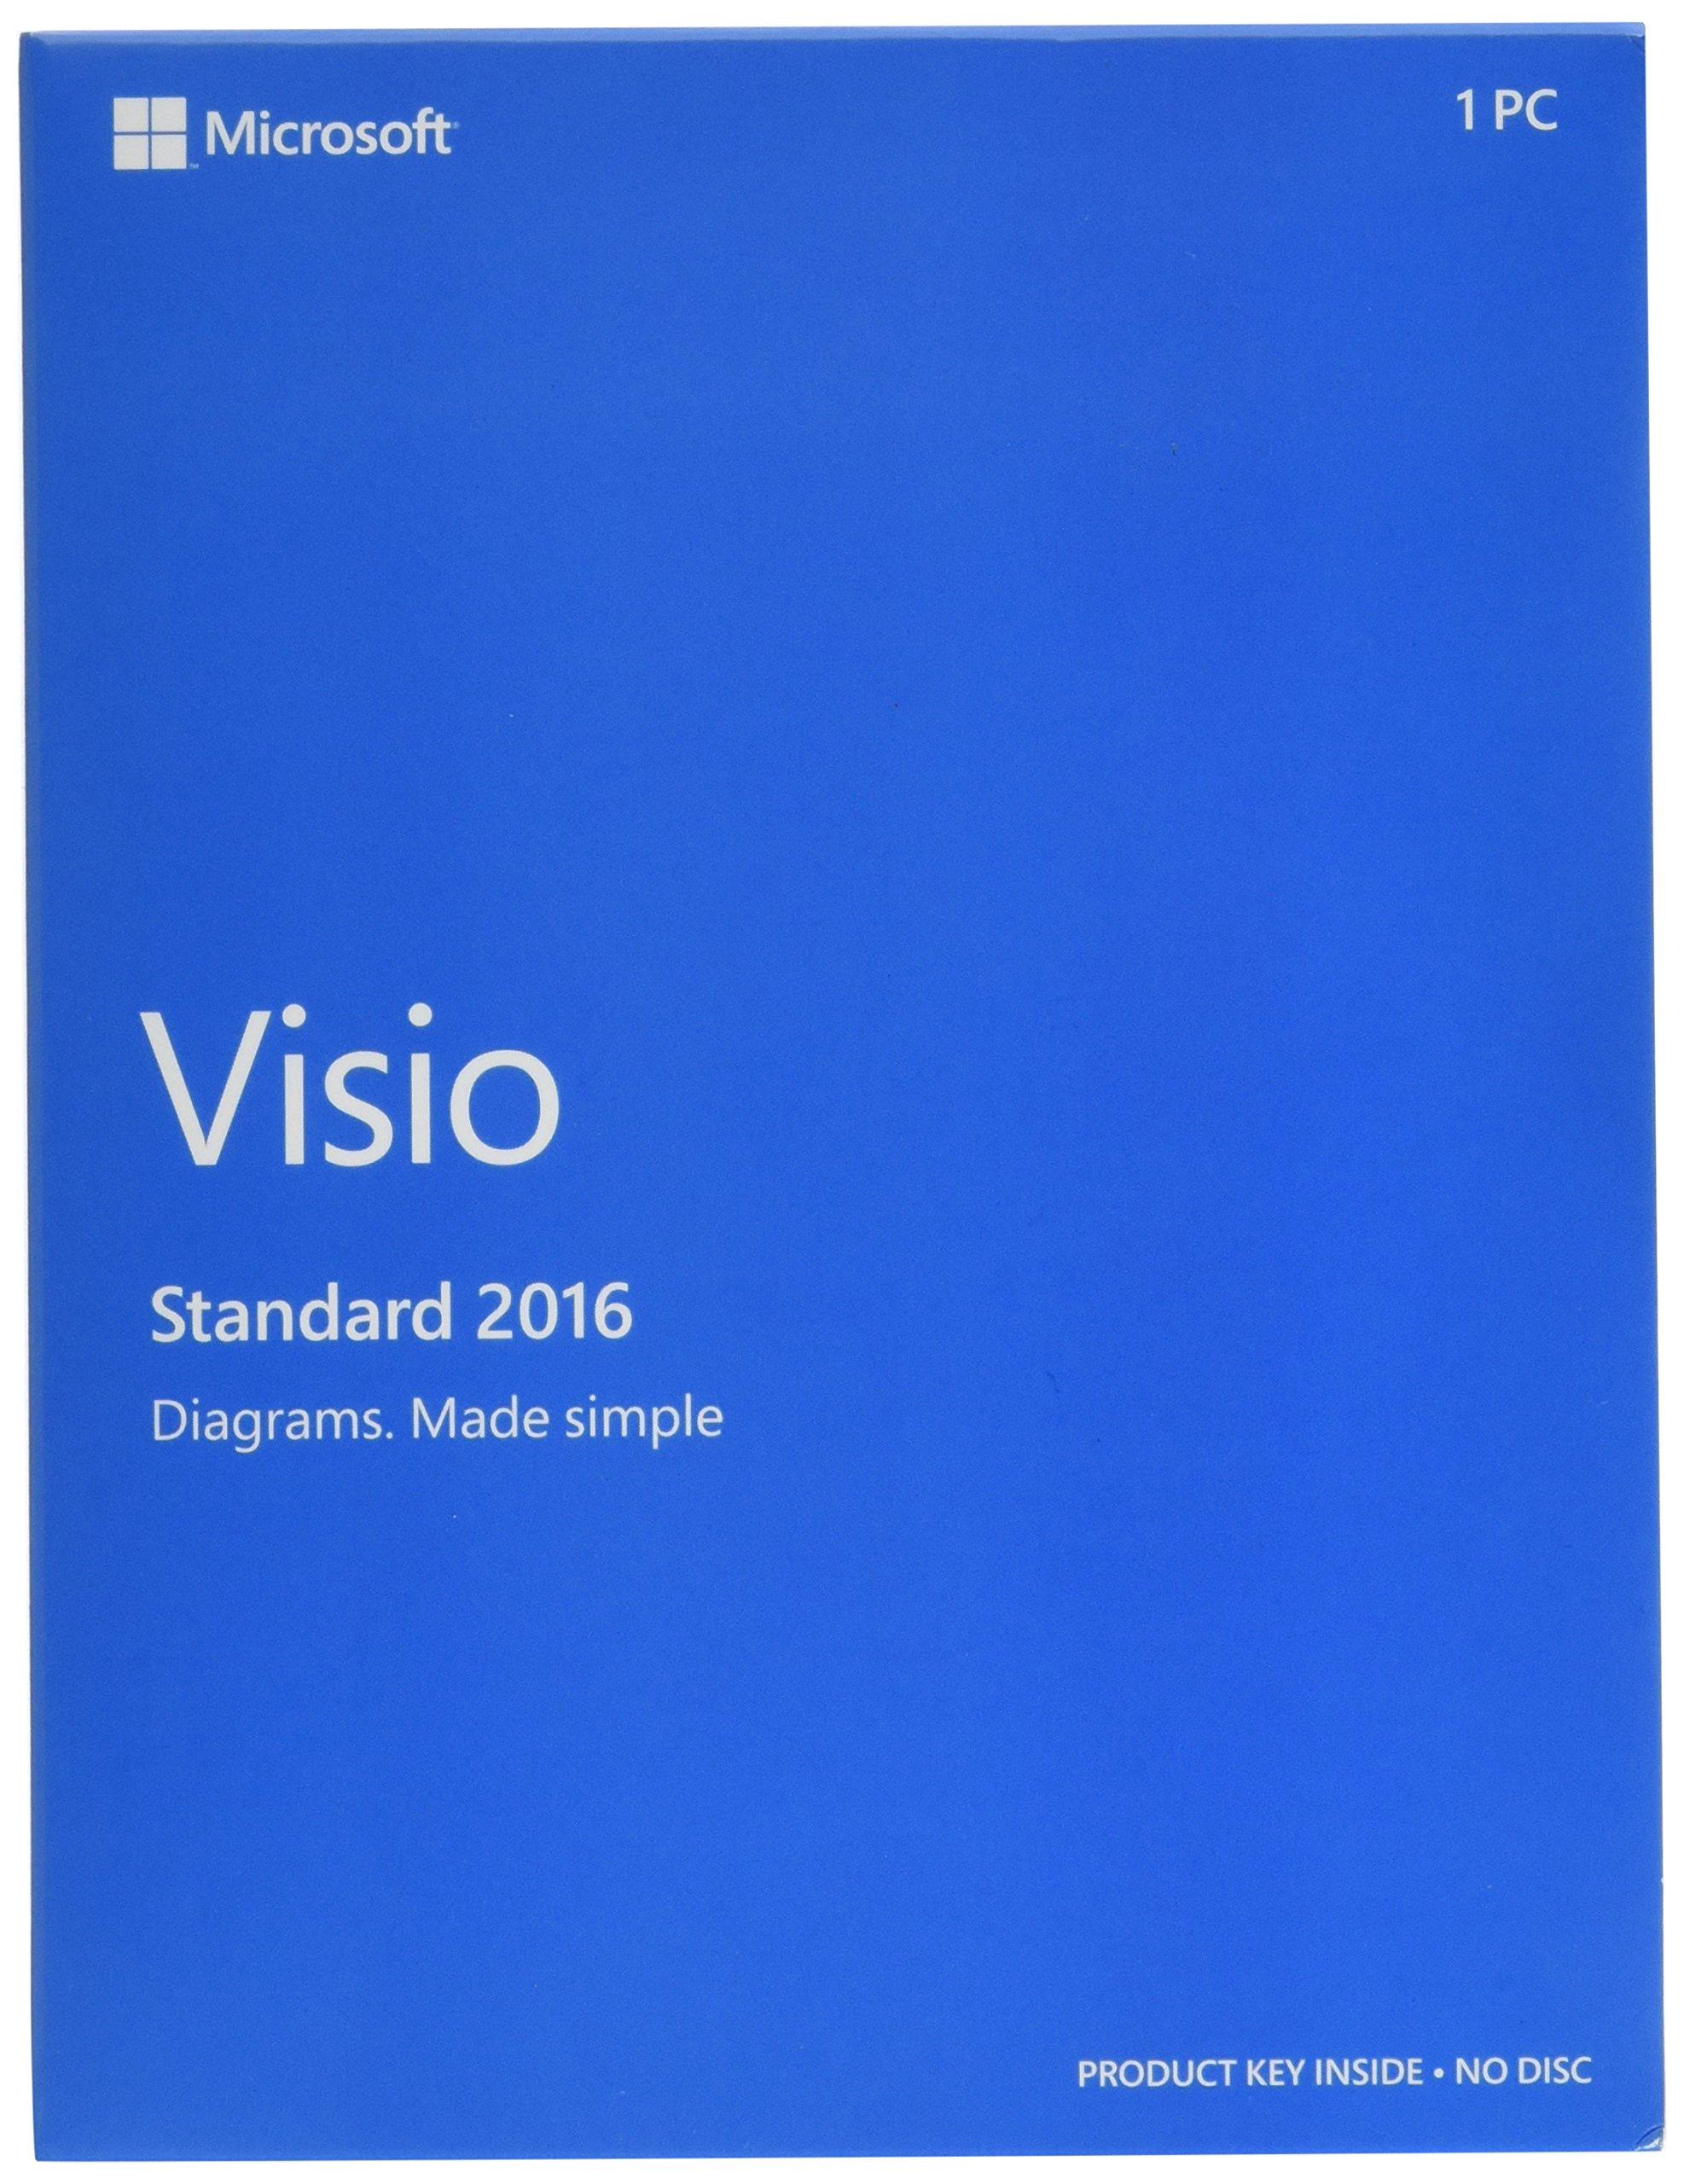 Microsoft Visio Standard 2016 by Microsoft